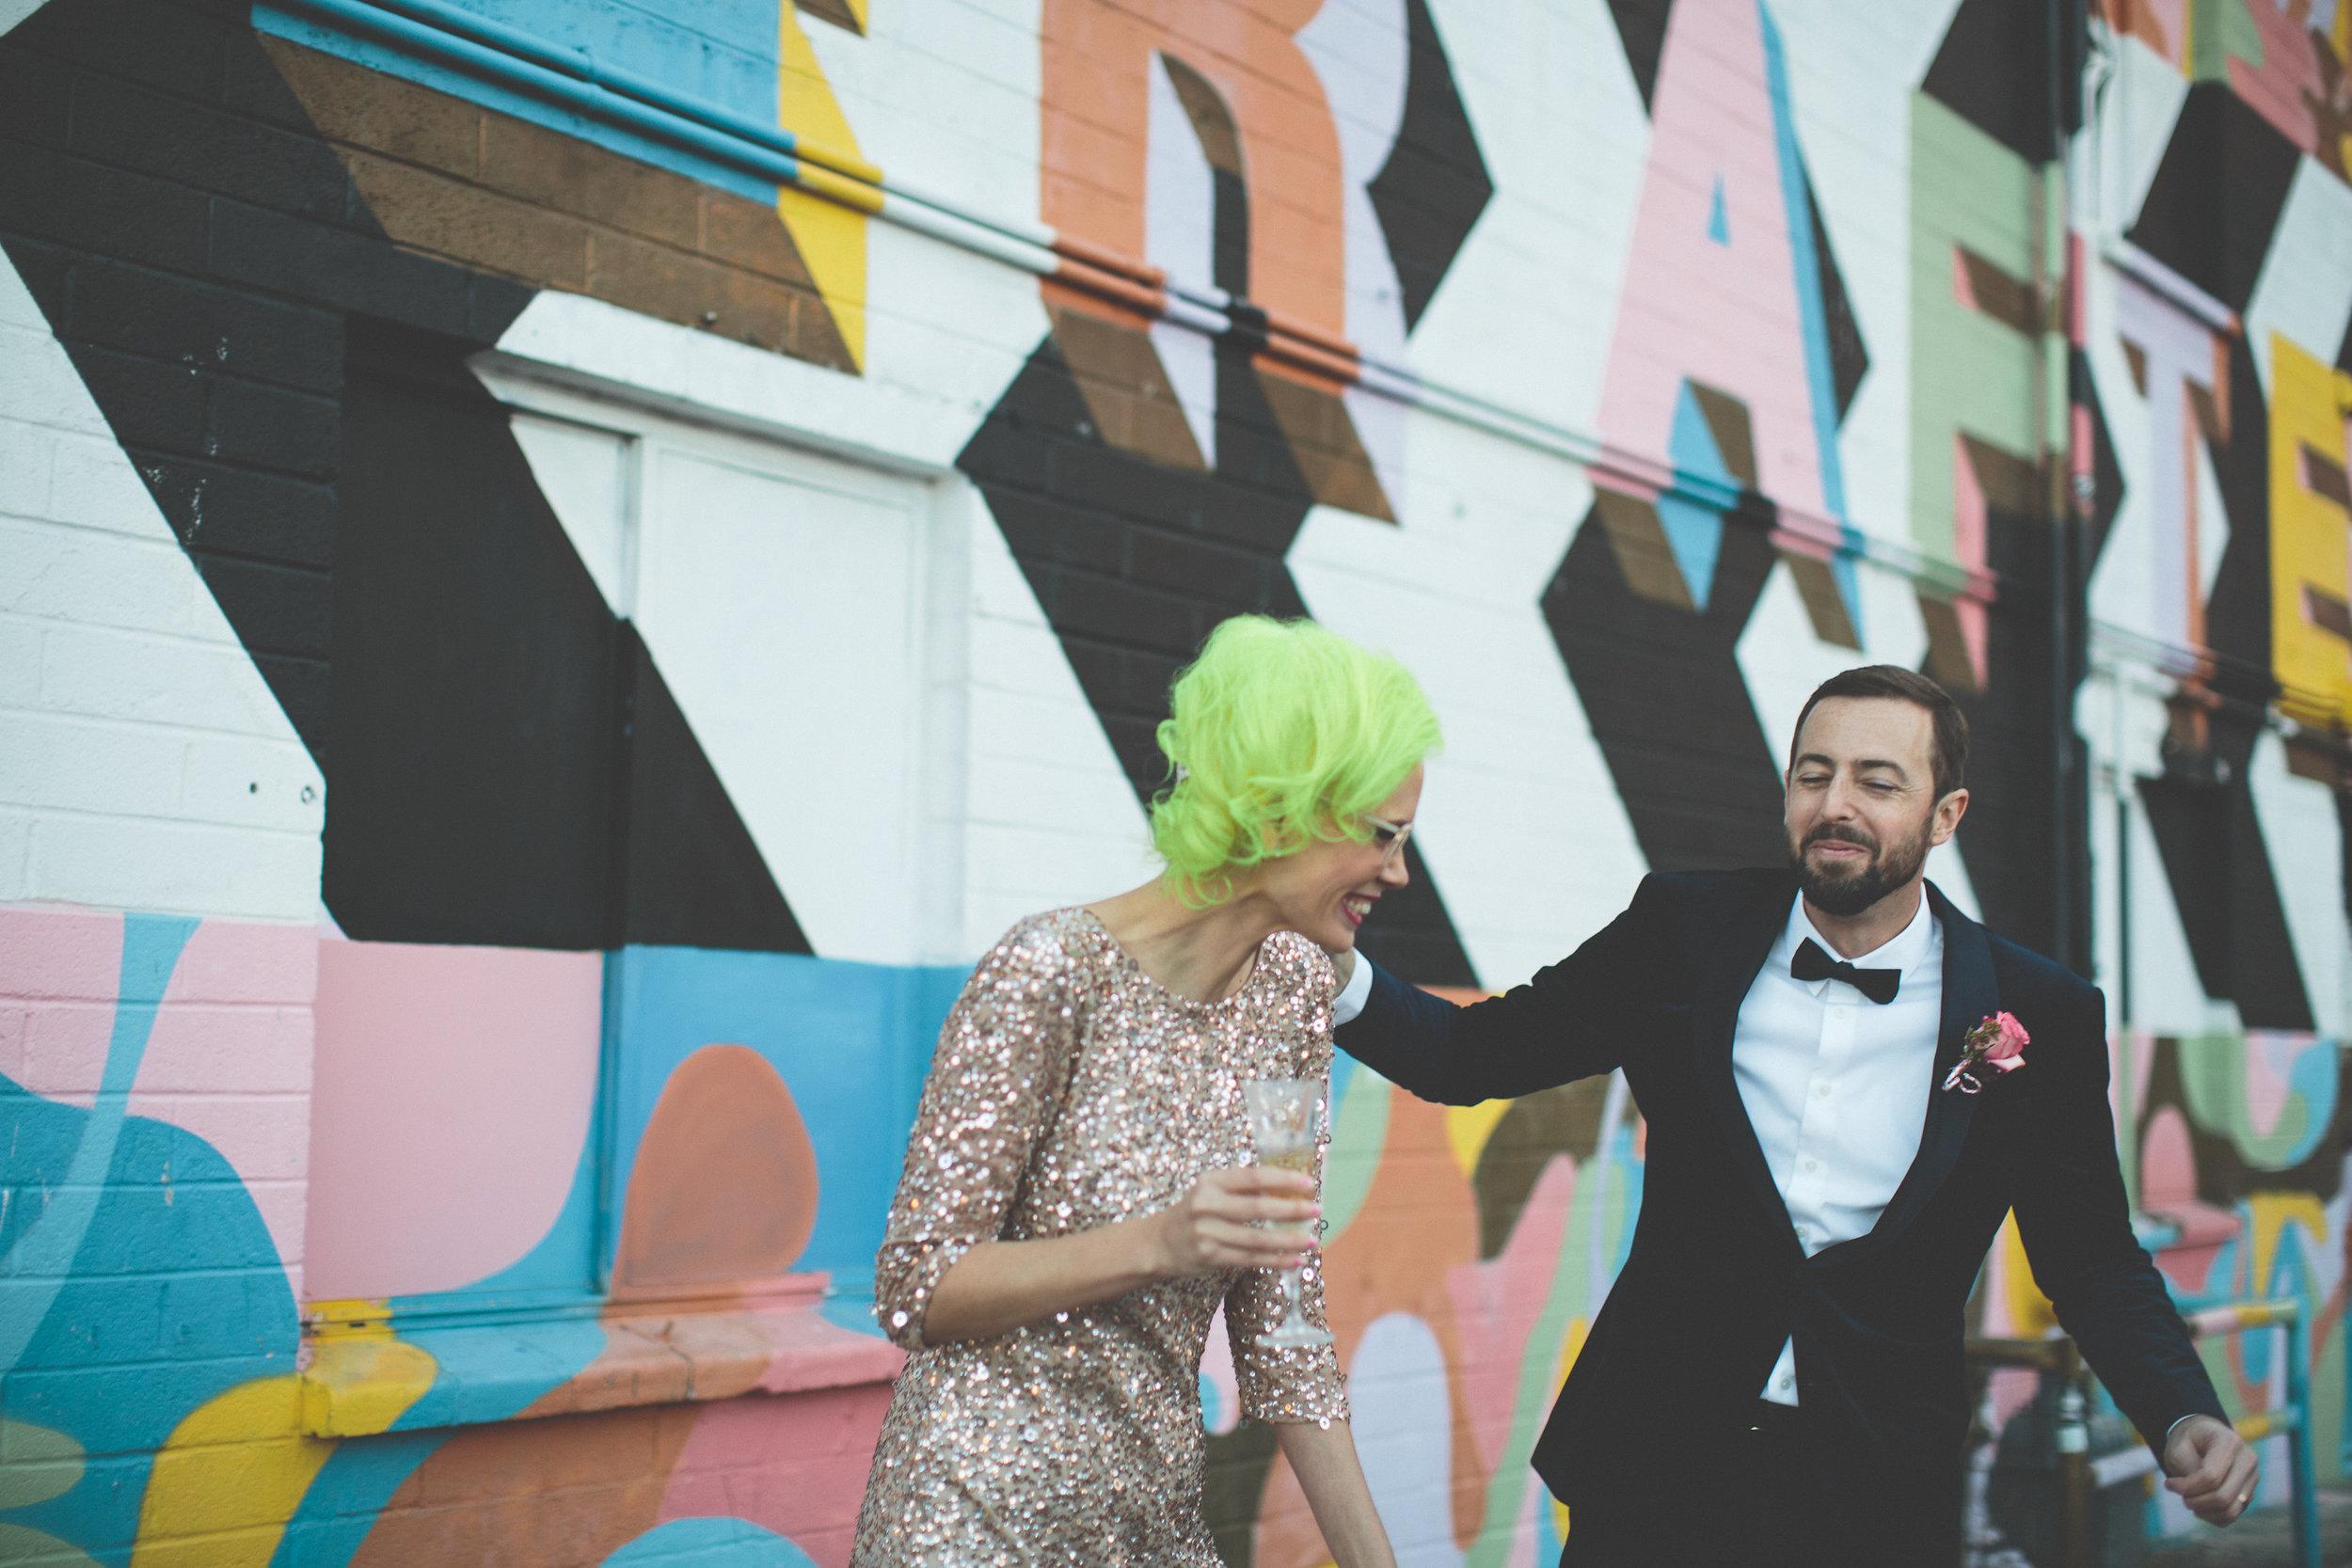 katie-and-erics-bright-downtown-las-vegas-elopement29.jpg